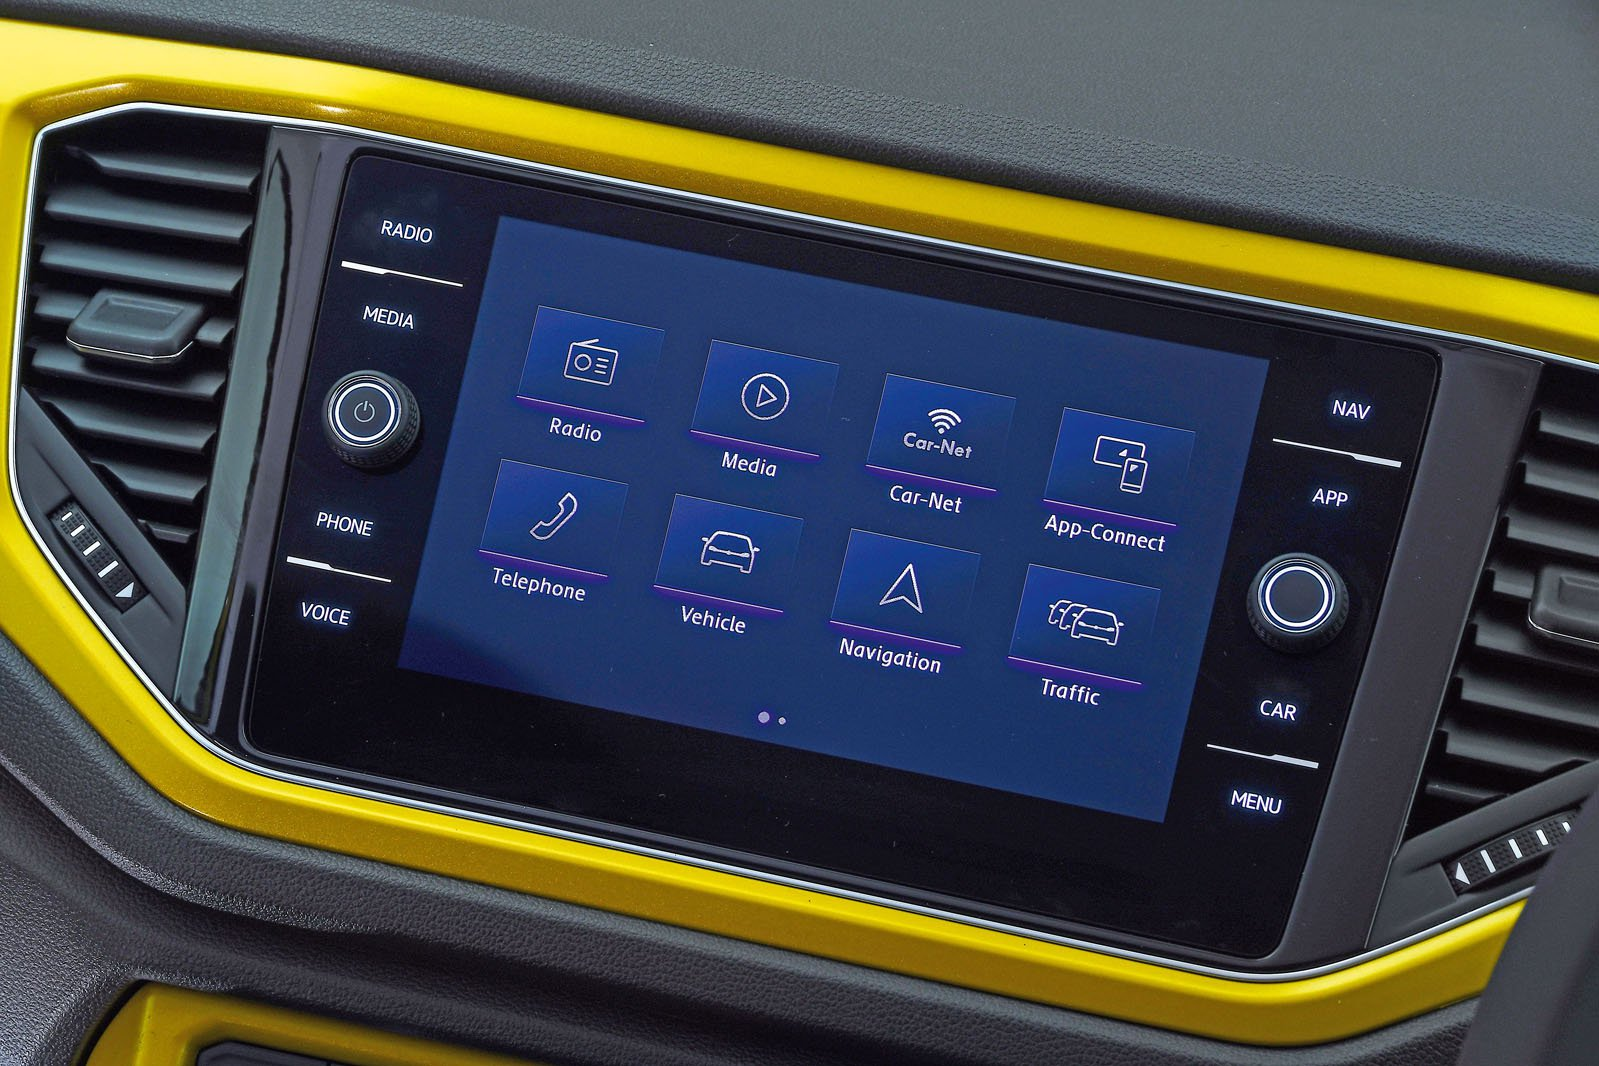 VW T-Roc infotainment